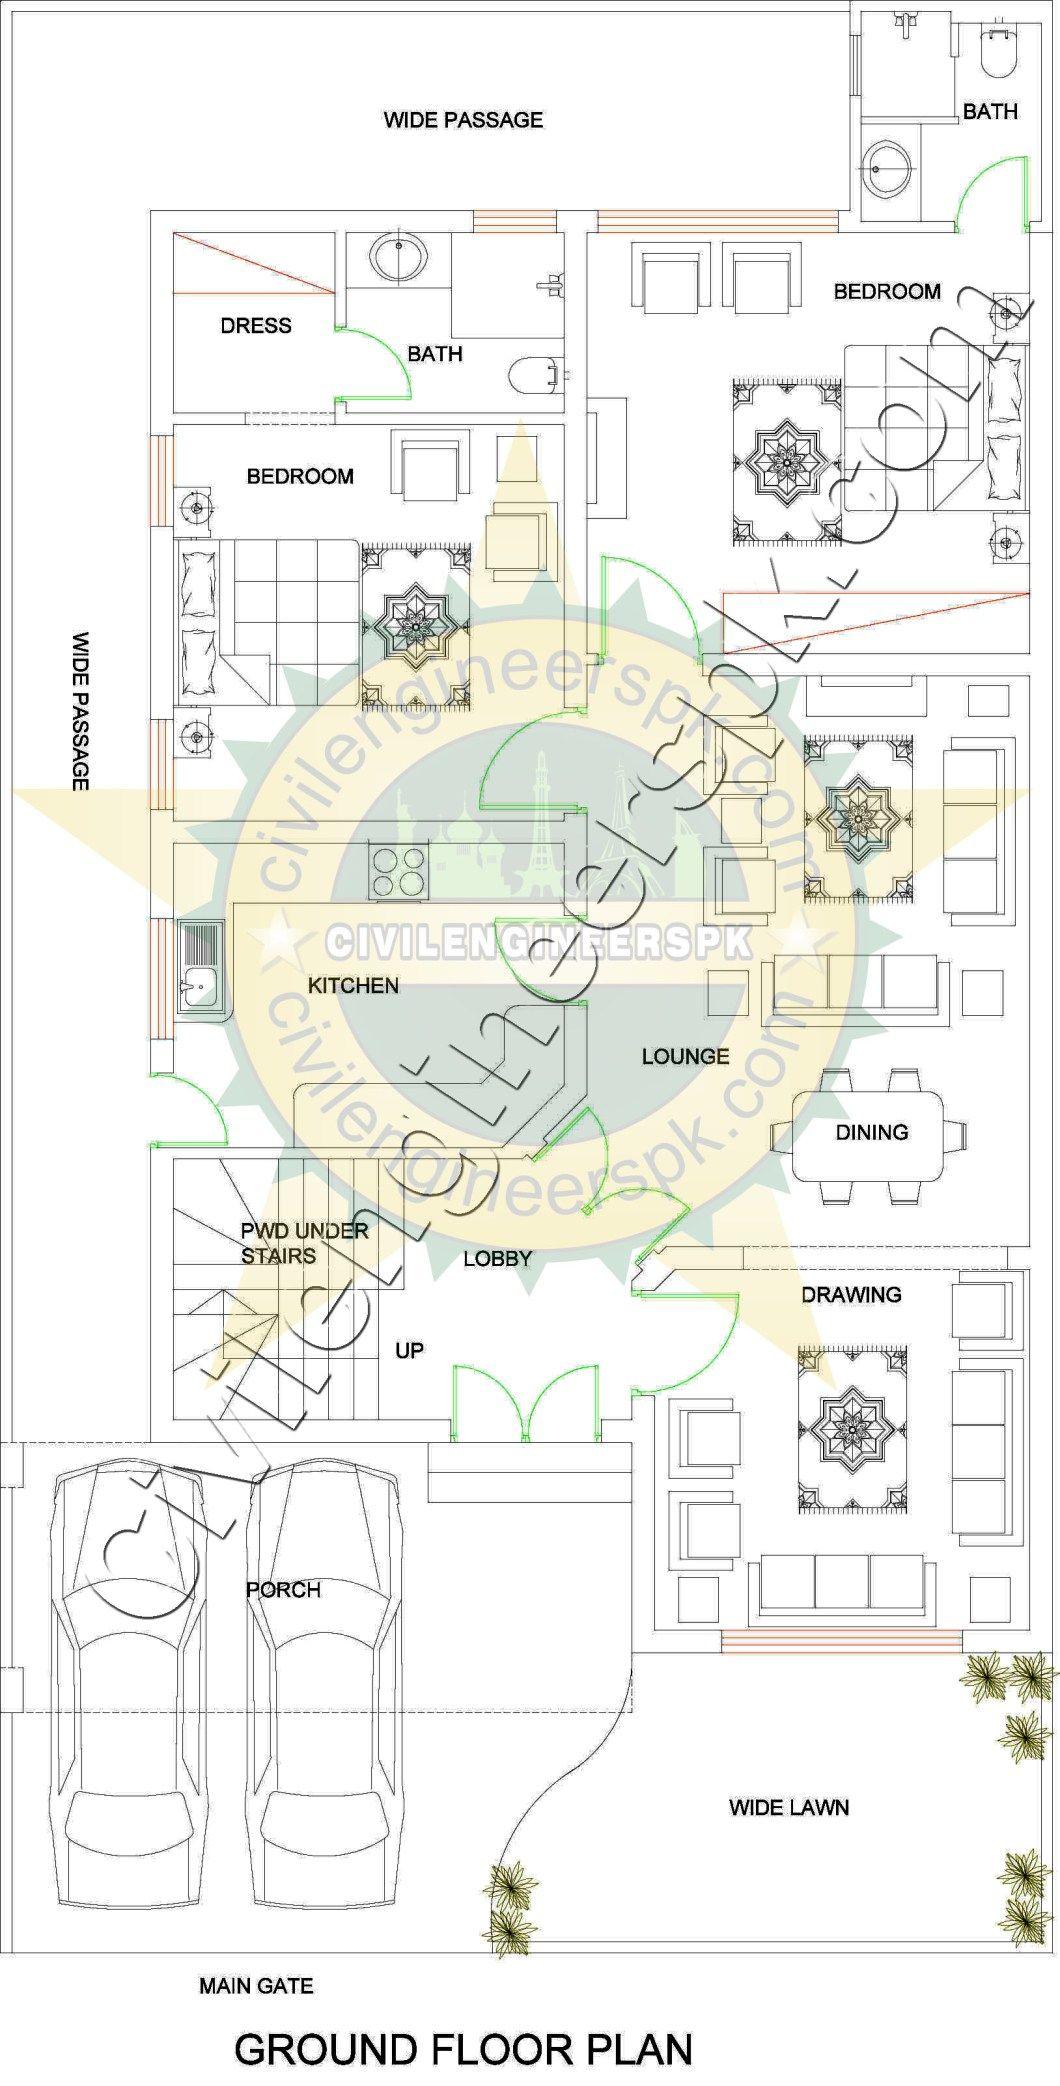 10 Marla Beautiful House Design Civil Engineers PK